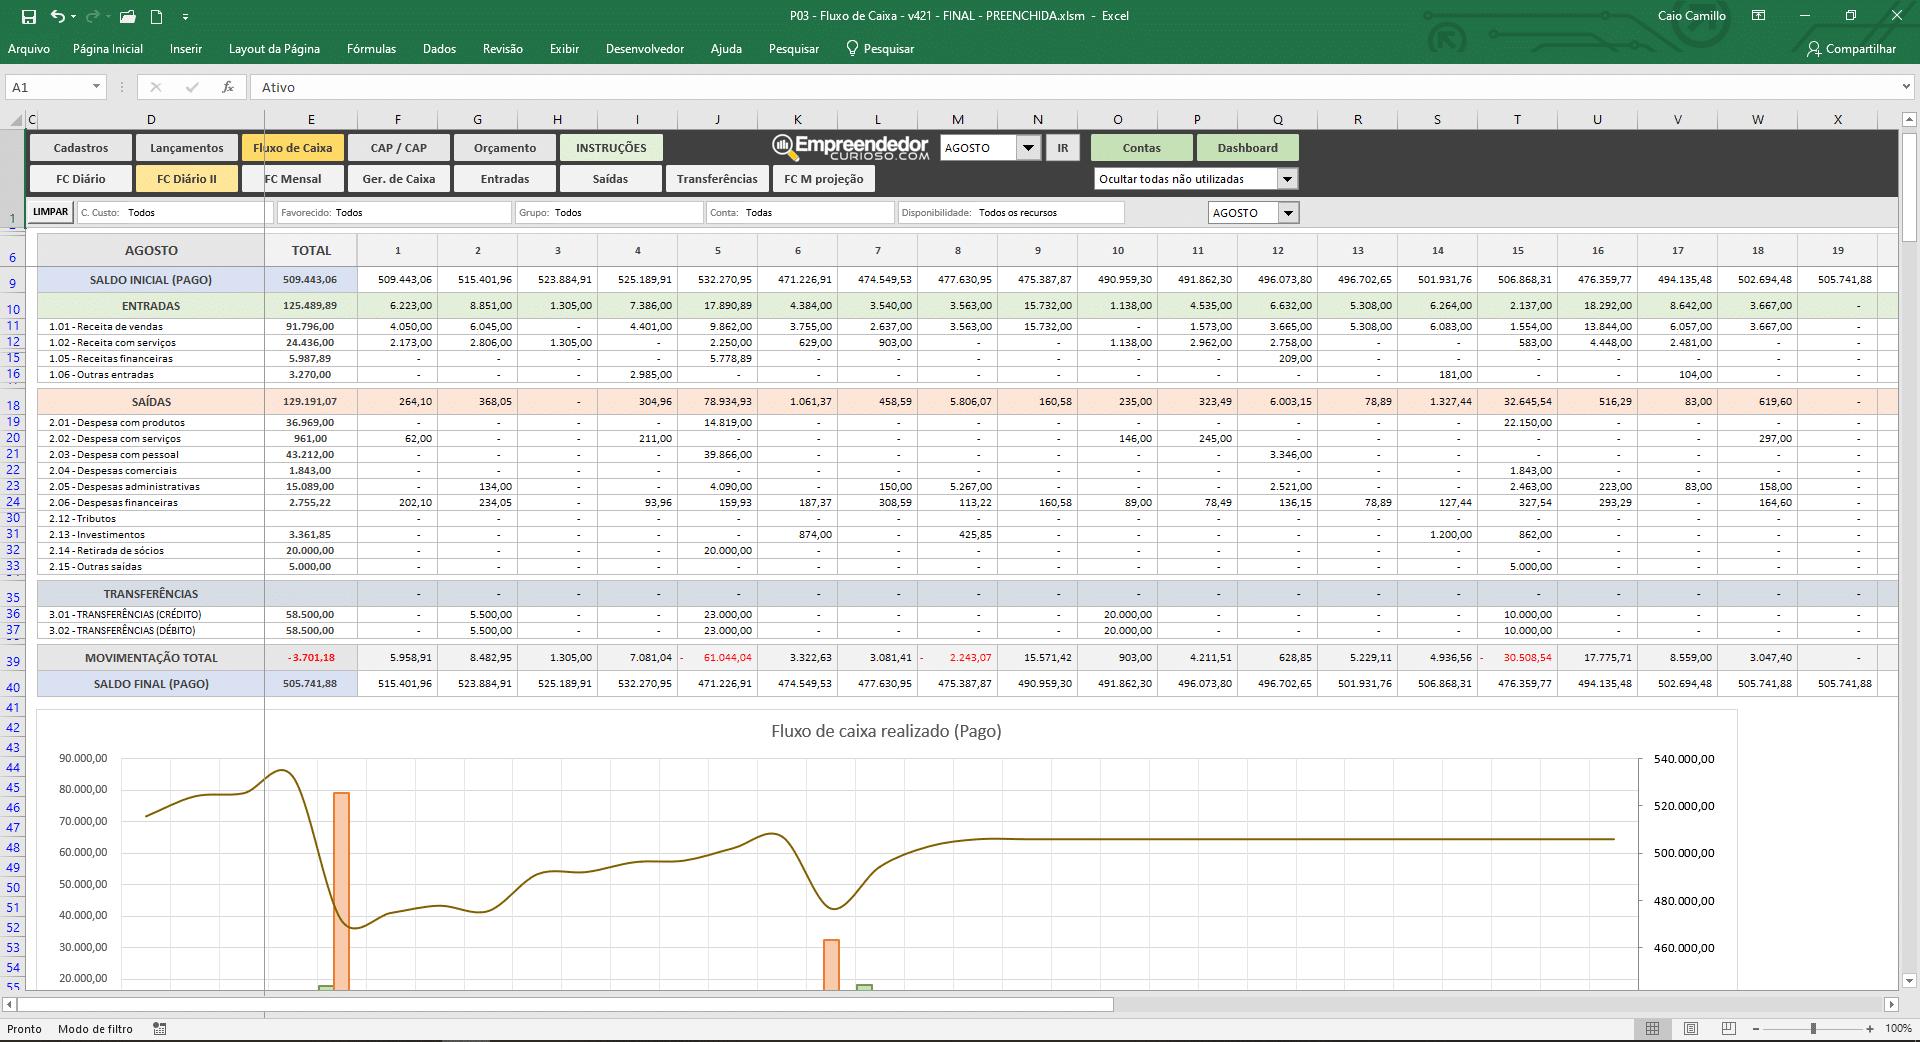 planilha de fluxo de caixa, controle financeiro - Fluxo diário